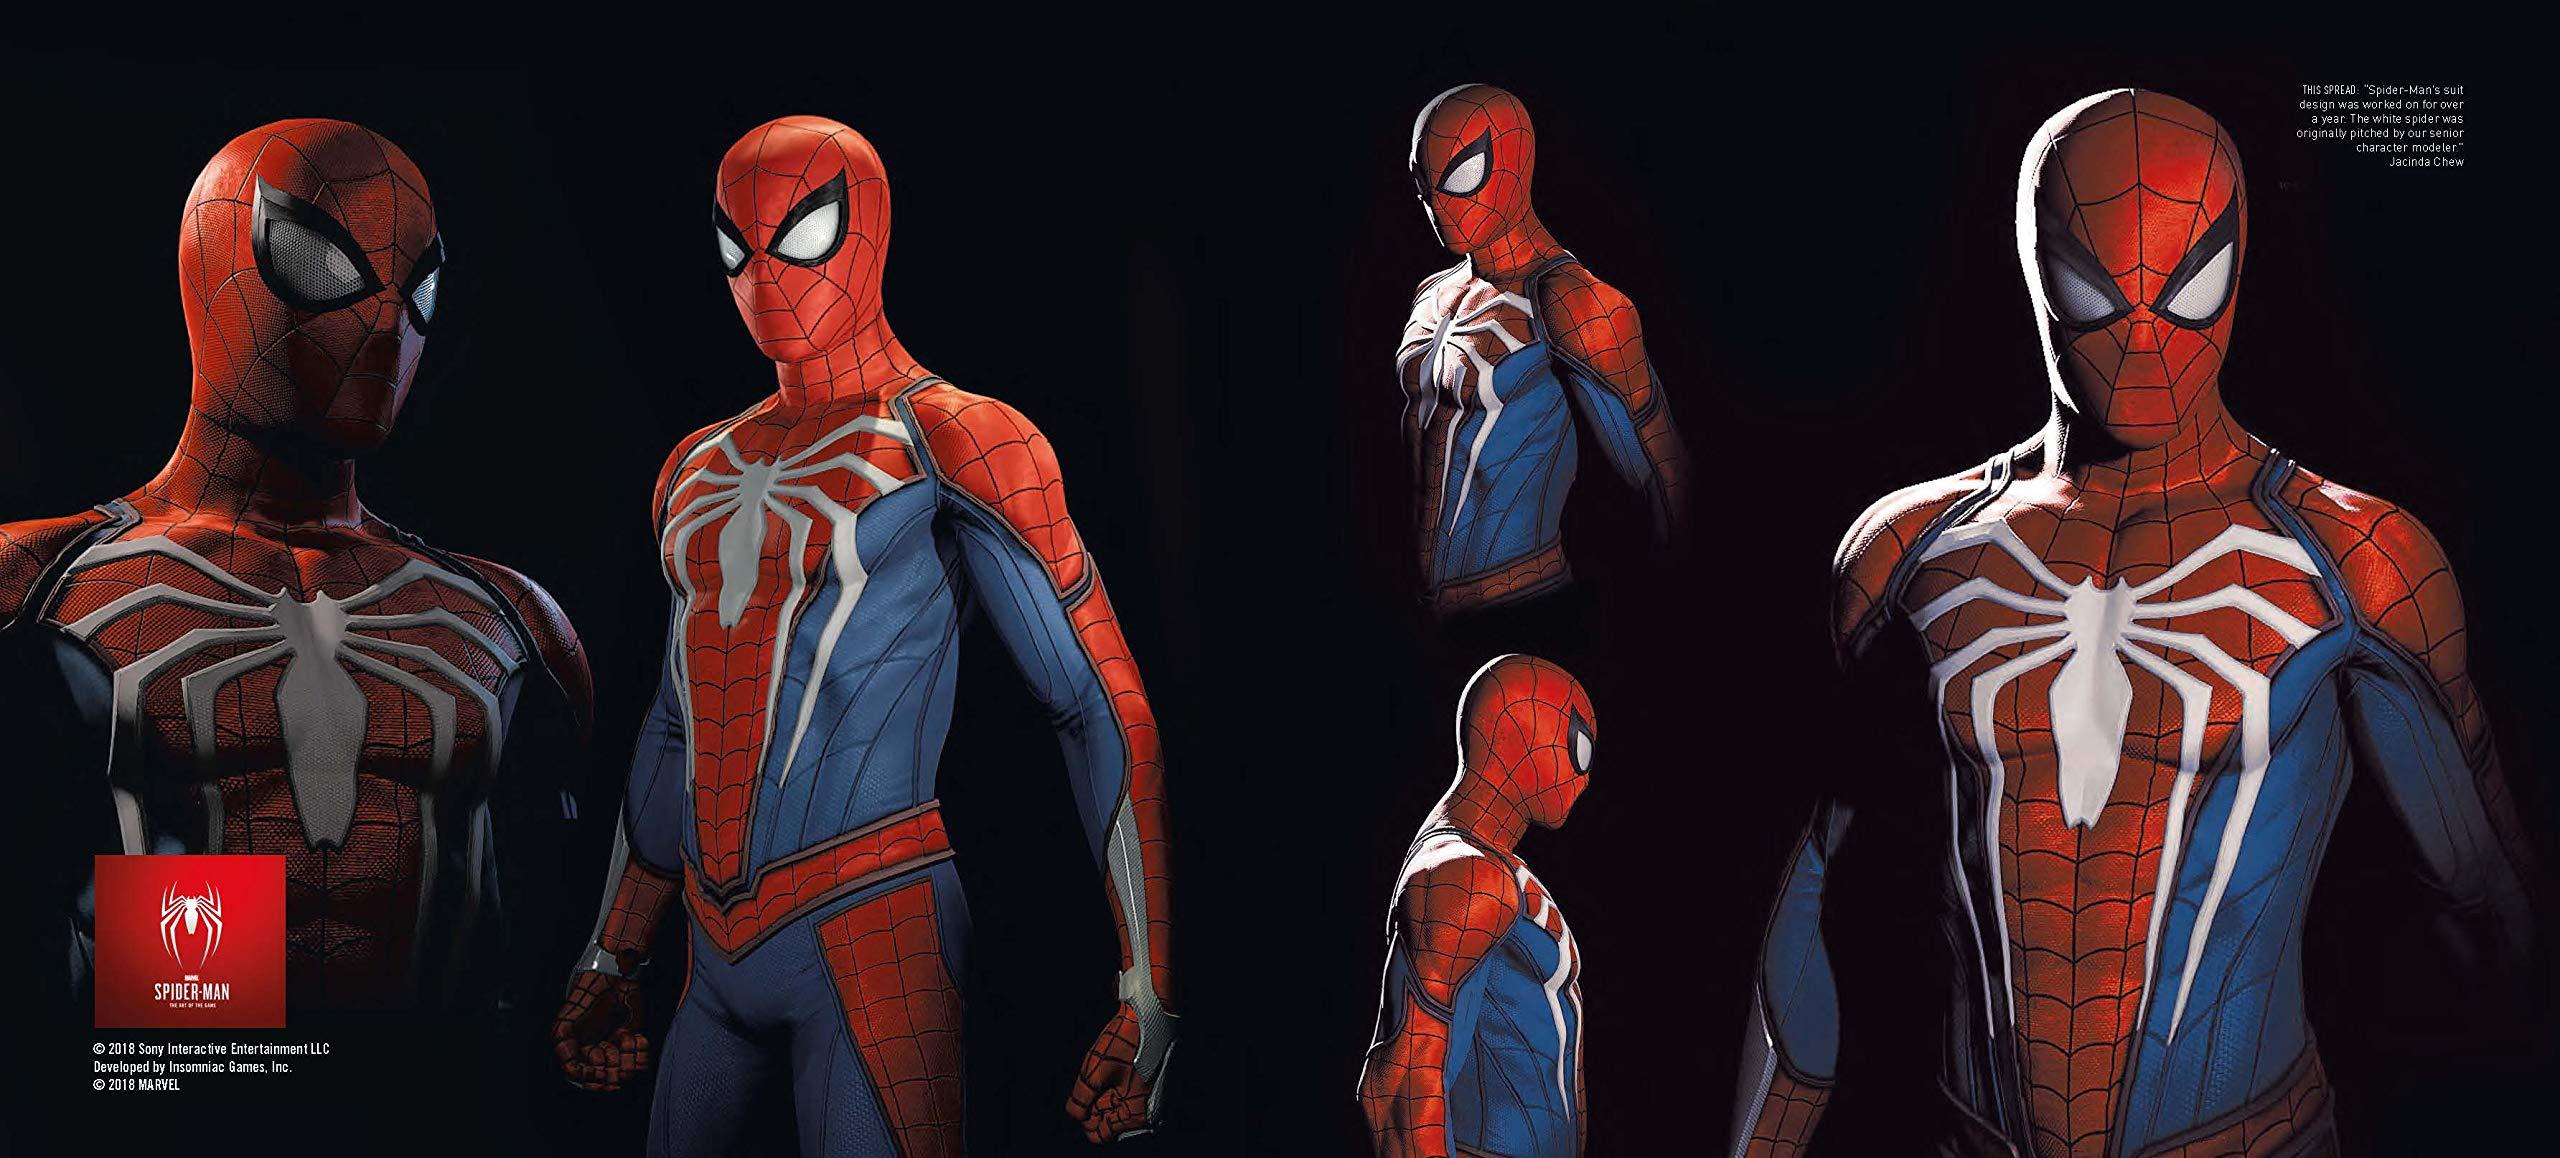 Spider-Man PS4 Walkthrough Part 9 – Don't Touch the Art